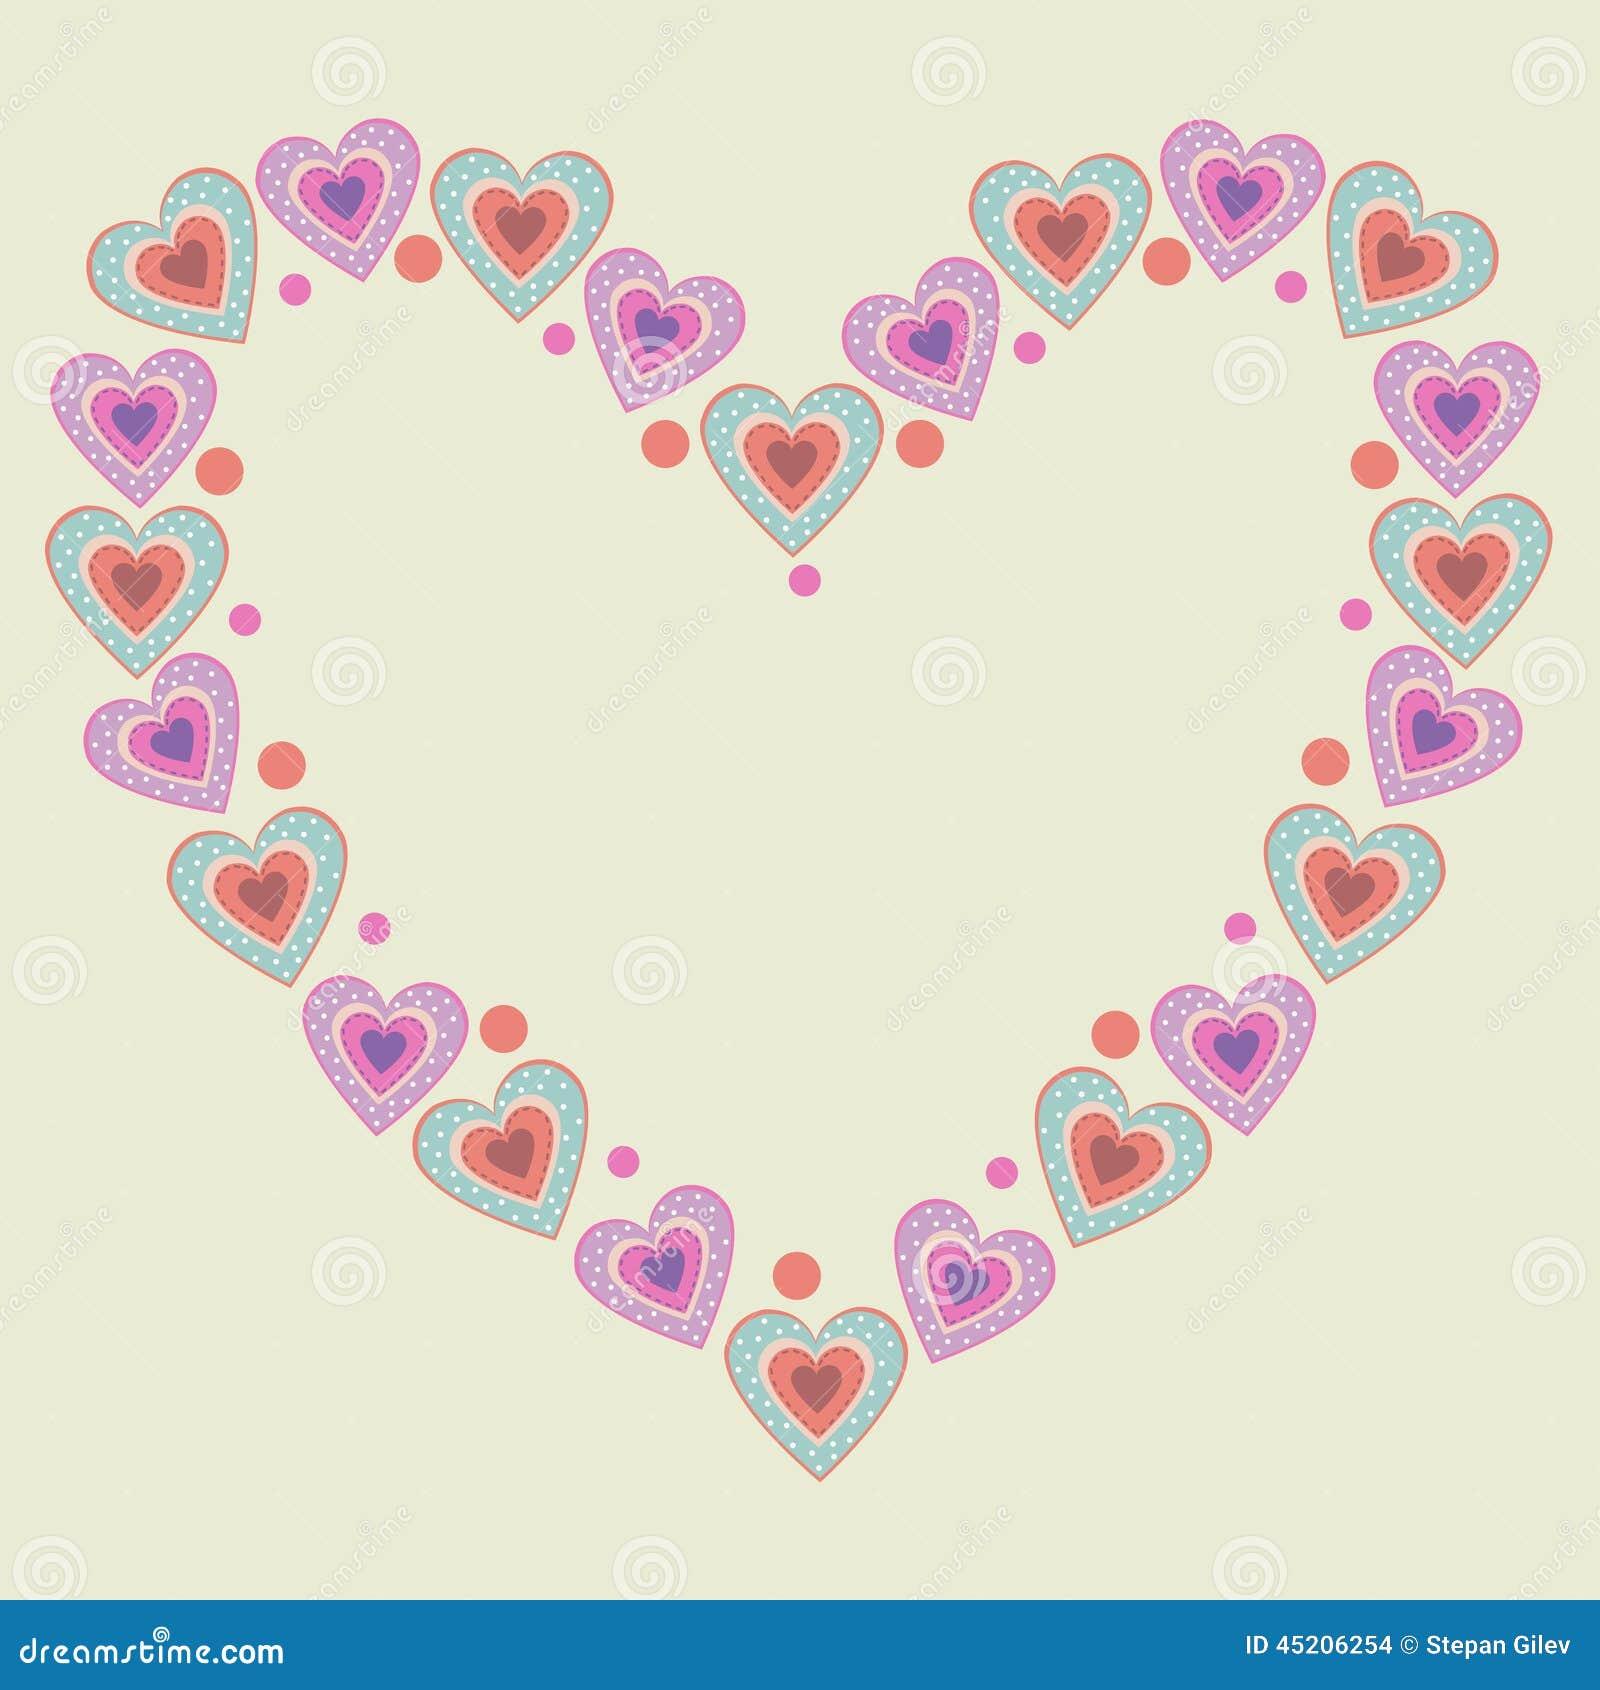 Cute heart frame stock vector. Illustration of element - 45206254